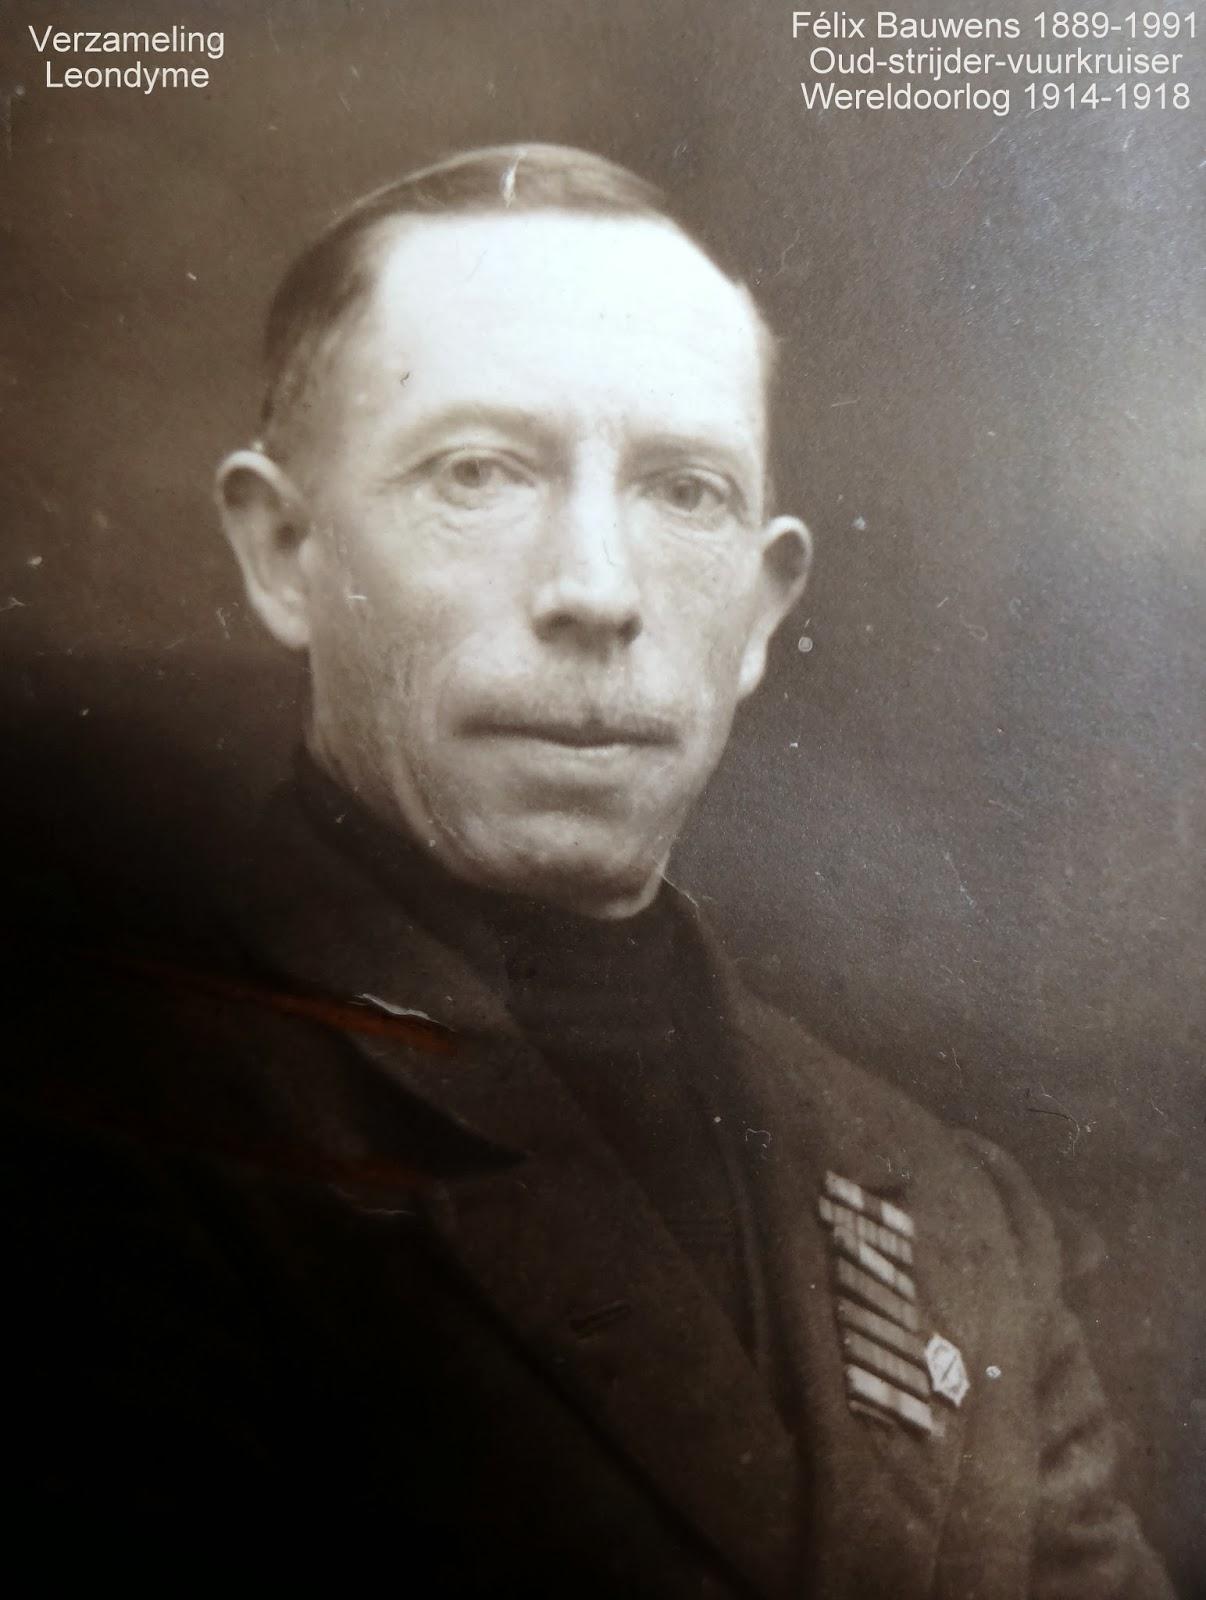 Oud-strijder-vuurkruiser en oorlogsinvalide Félix Bauwens 1889-1991. Foto uit legerarchief van Evere